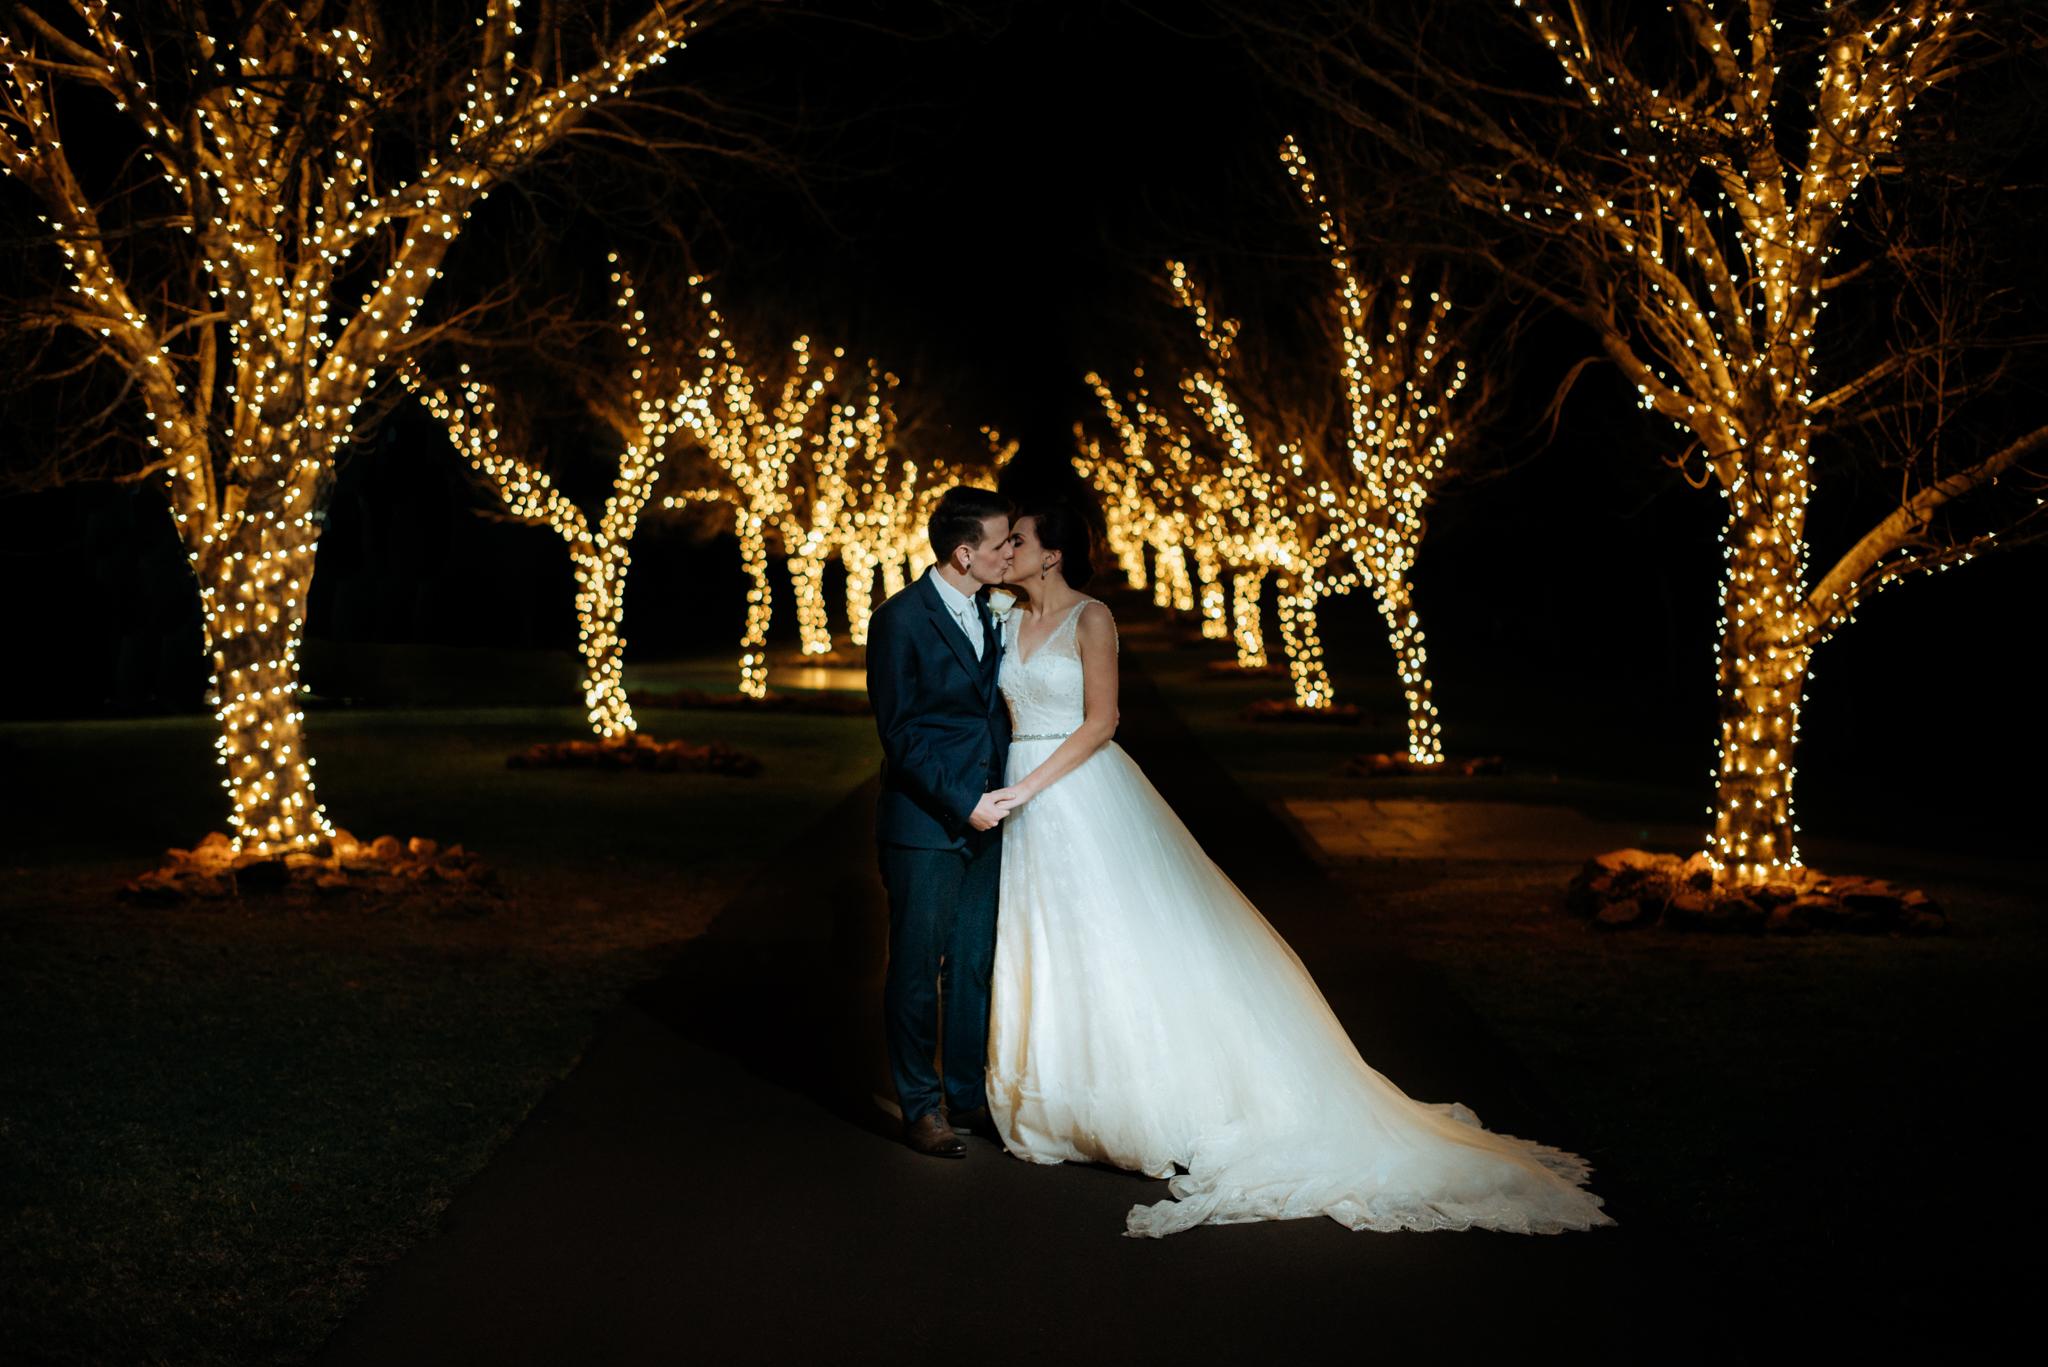 LOVELENSCAPES PHOTOGRAPHY • PRESTON PEAK WINERY WEDDING • TOOWOOMBA WEDDING PHOTOGRAPHER • 174.jpg